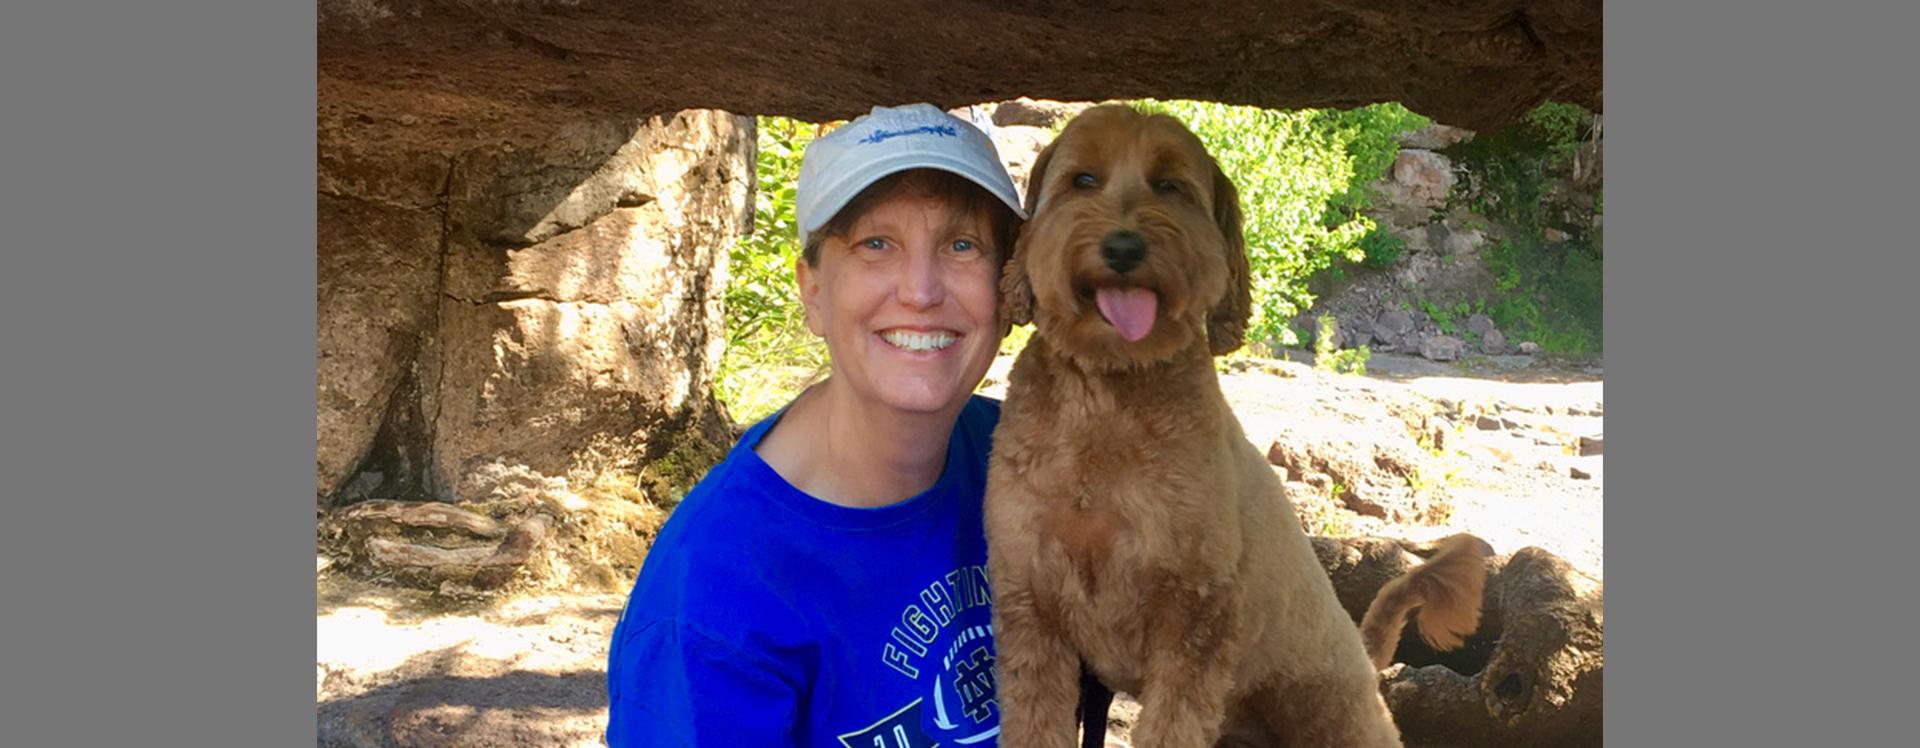 Rachel Henrichs with her golden doodle dog named Holly